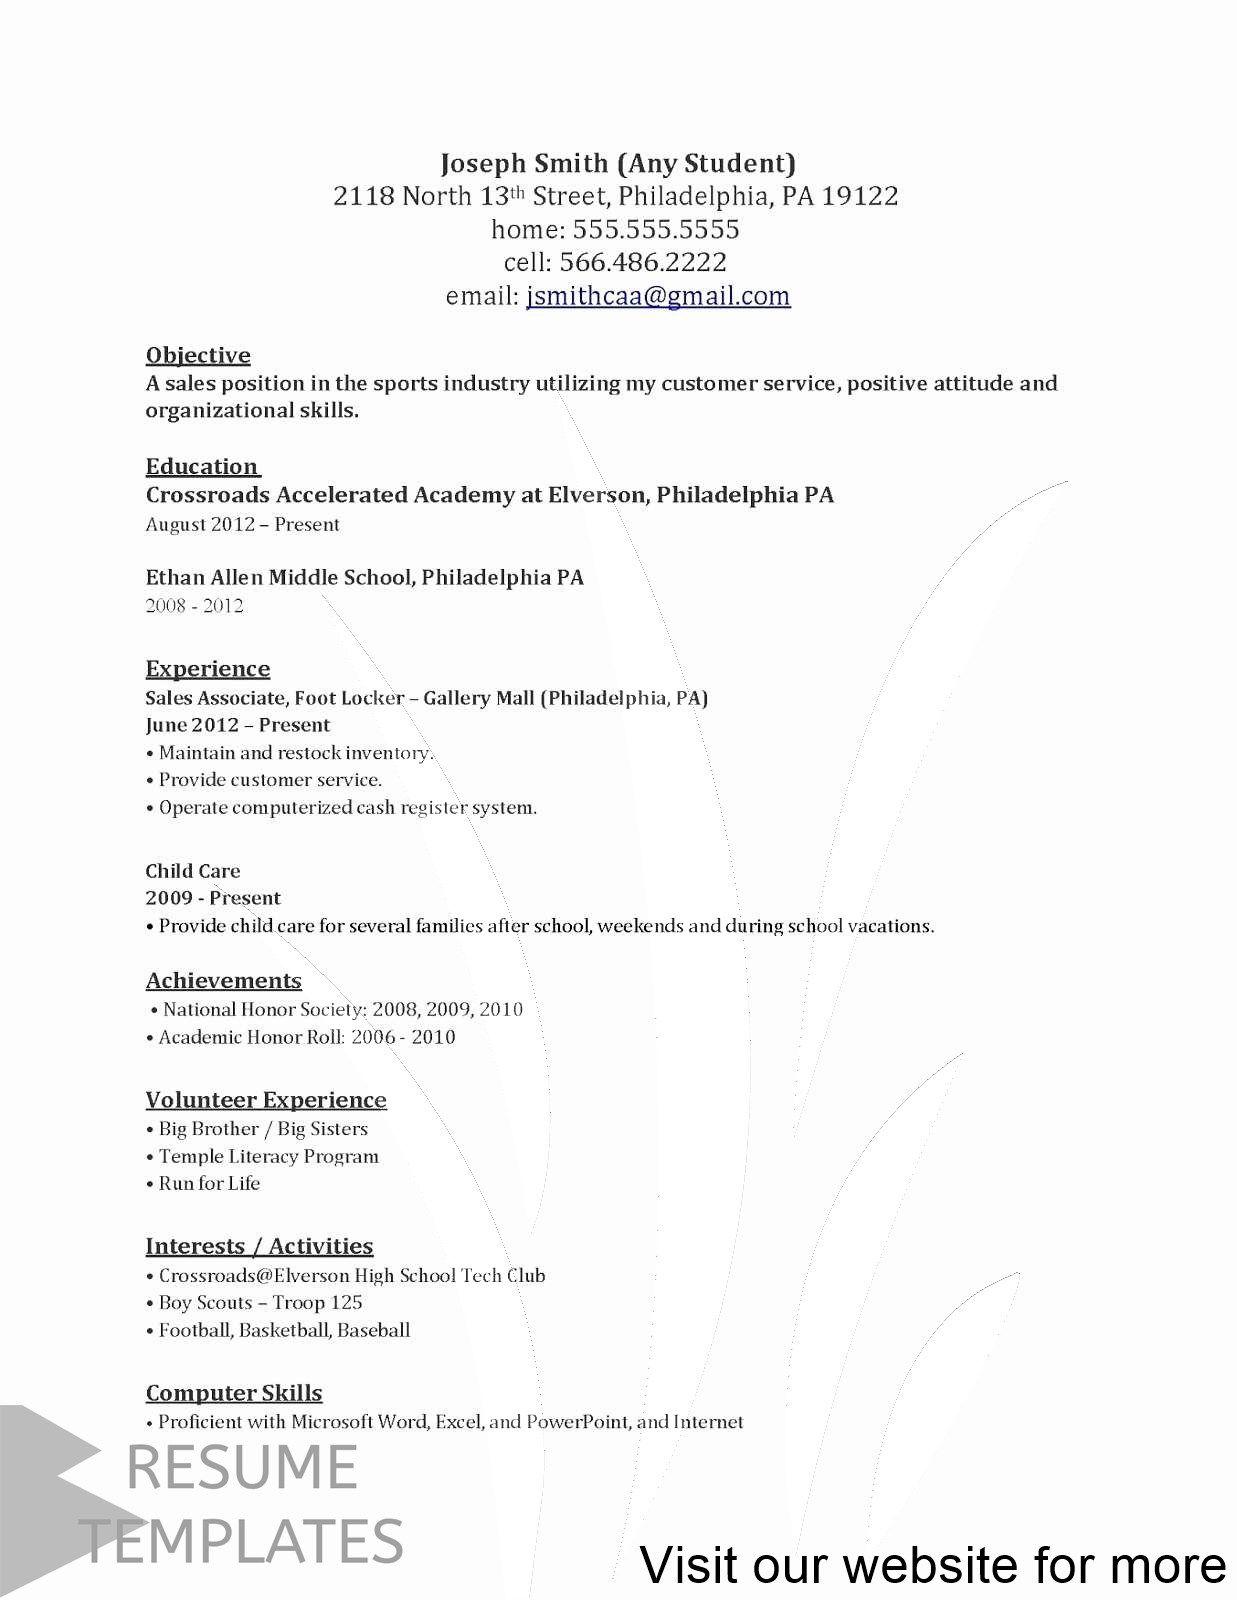 basic resume template free in 2020 resume, objective for restaurant manager google example sample cv format freshers